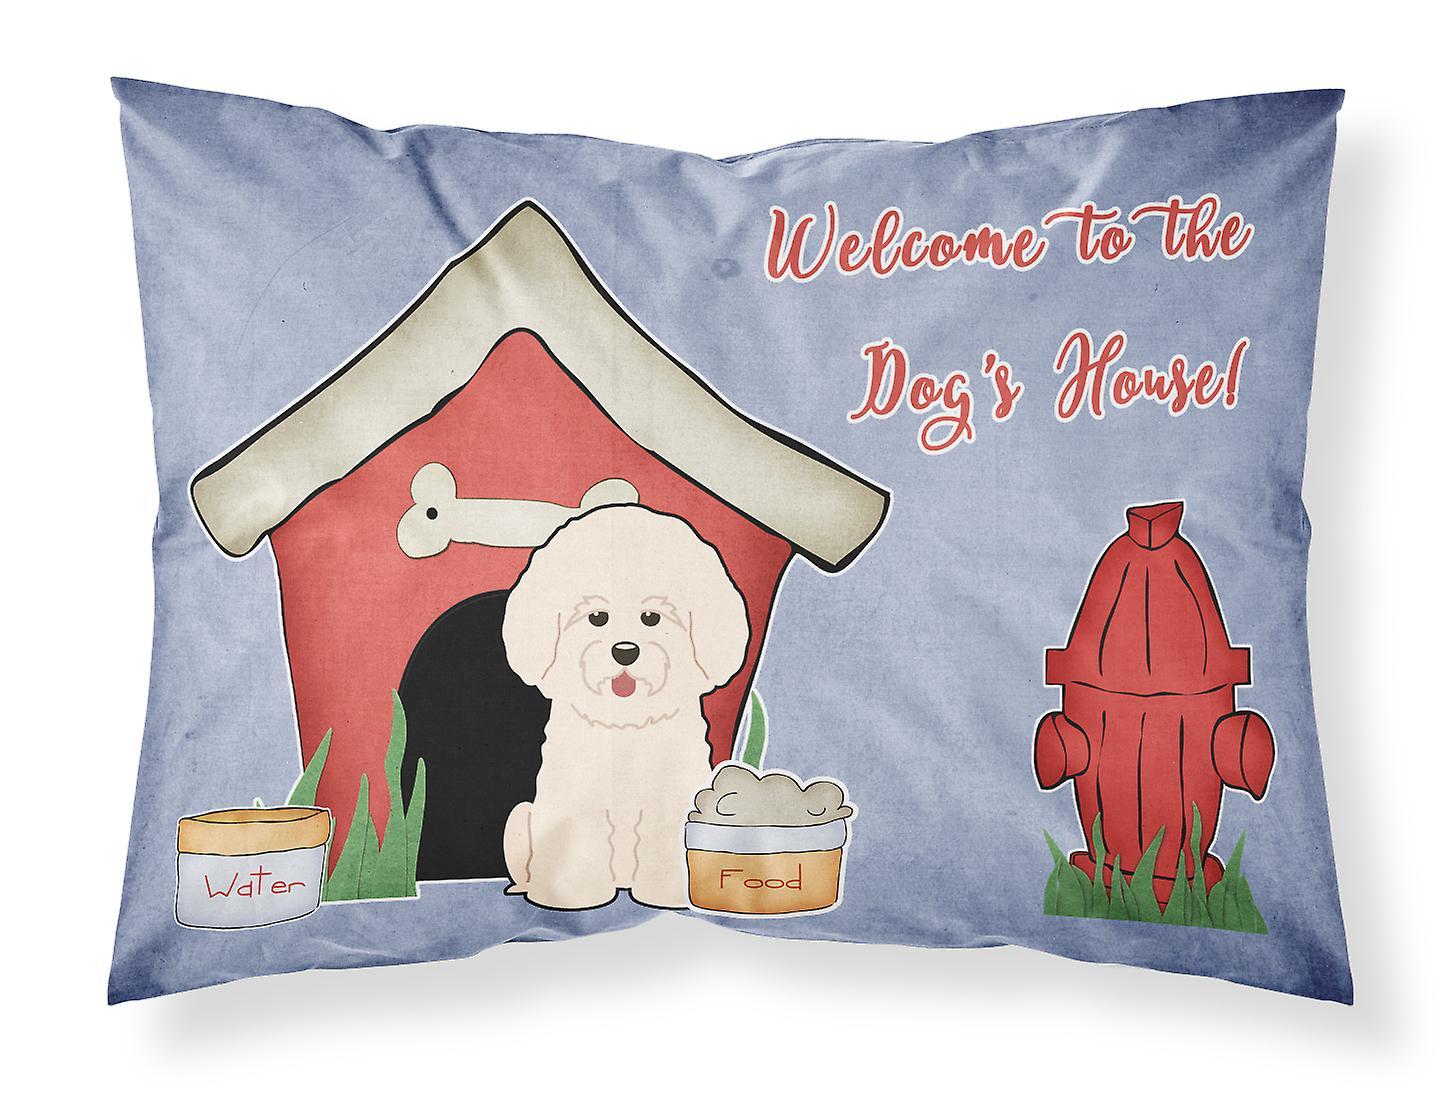 Dog Bichon Taie Frise D'oreiller House Tissu Standard Collection 5j4cqALS3R